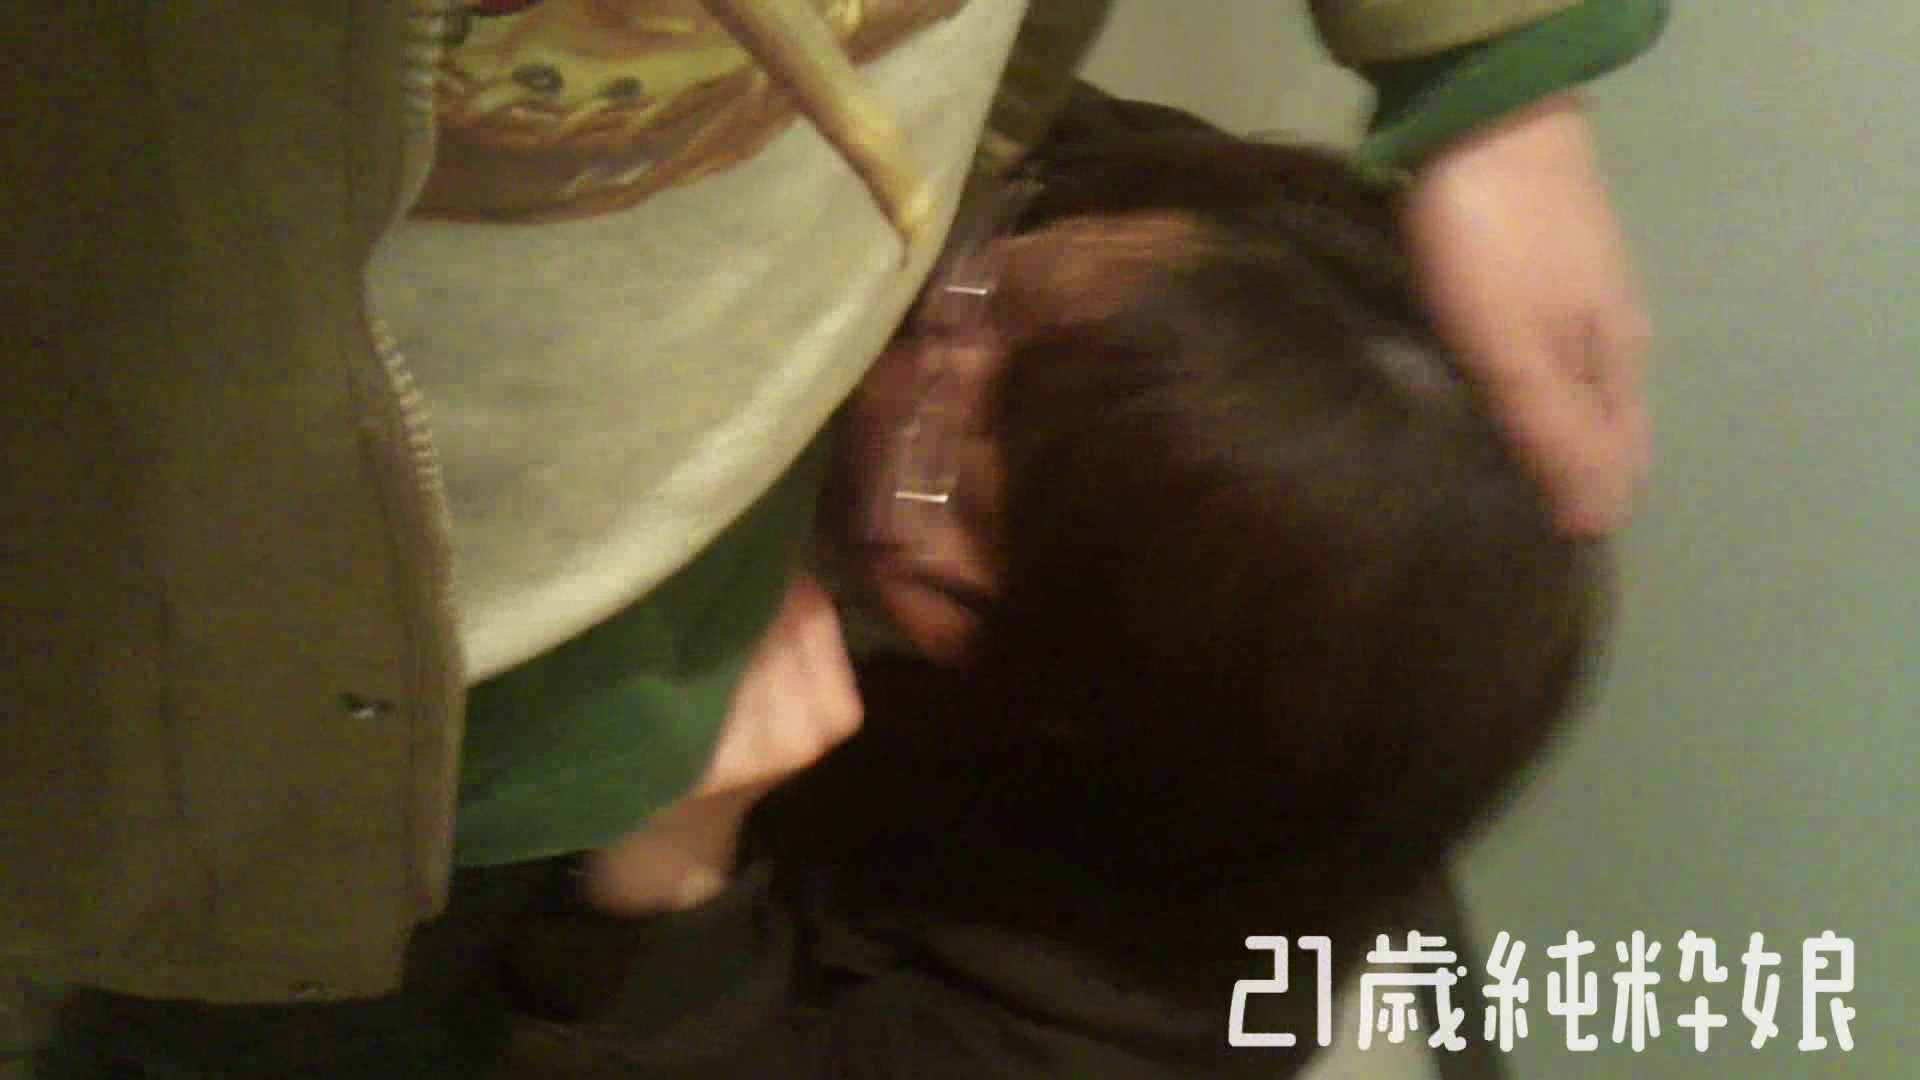 Gカップ21歳純粋嬢第2弾Vol.5 性欲丸出し | 学校  101pic 47